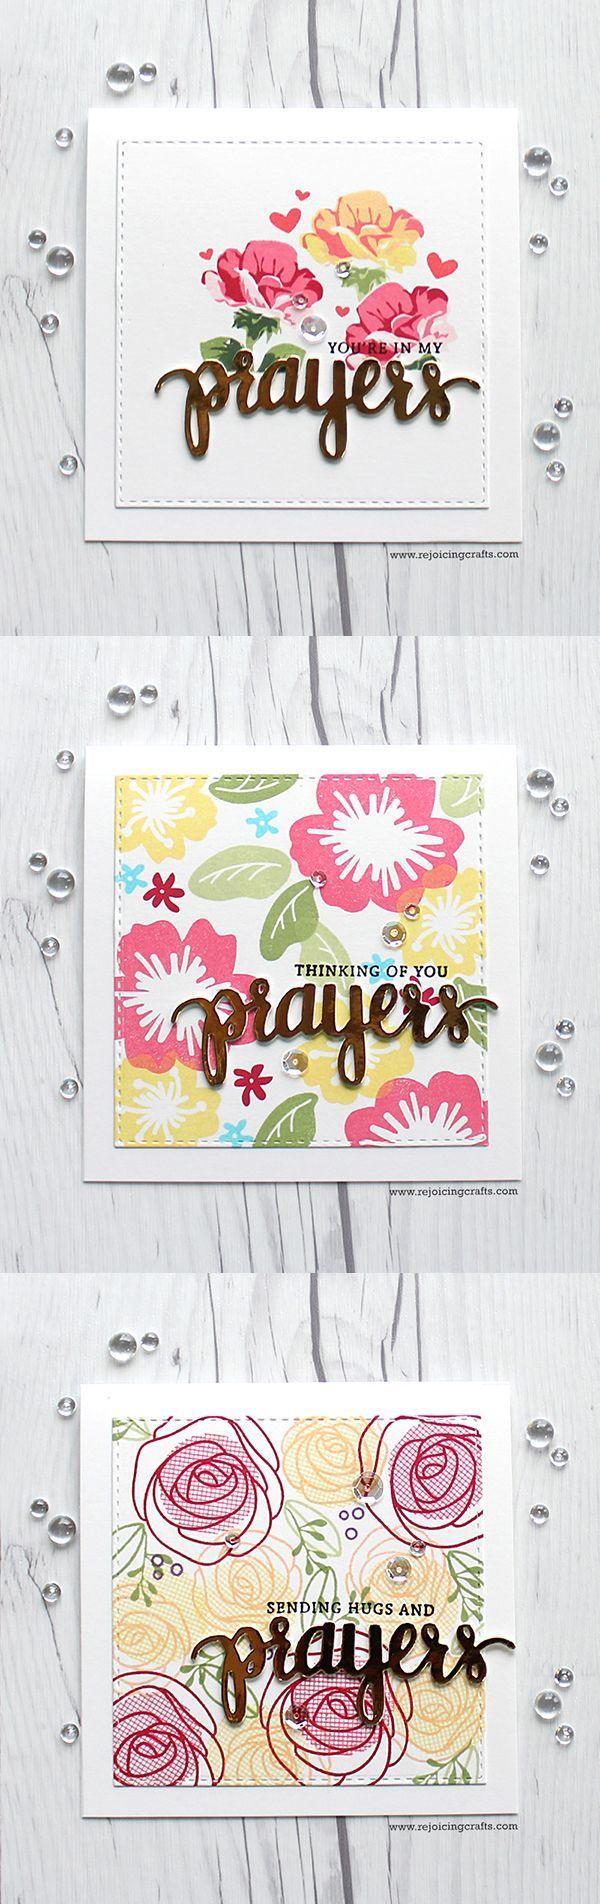 RejoicingCrafts: My floral cards with Simon Says Stamp floral stamp sets and Prayers stamp & Die set. #simonsaysstamp #flower #prayers #lastingheartscarddrive